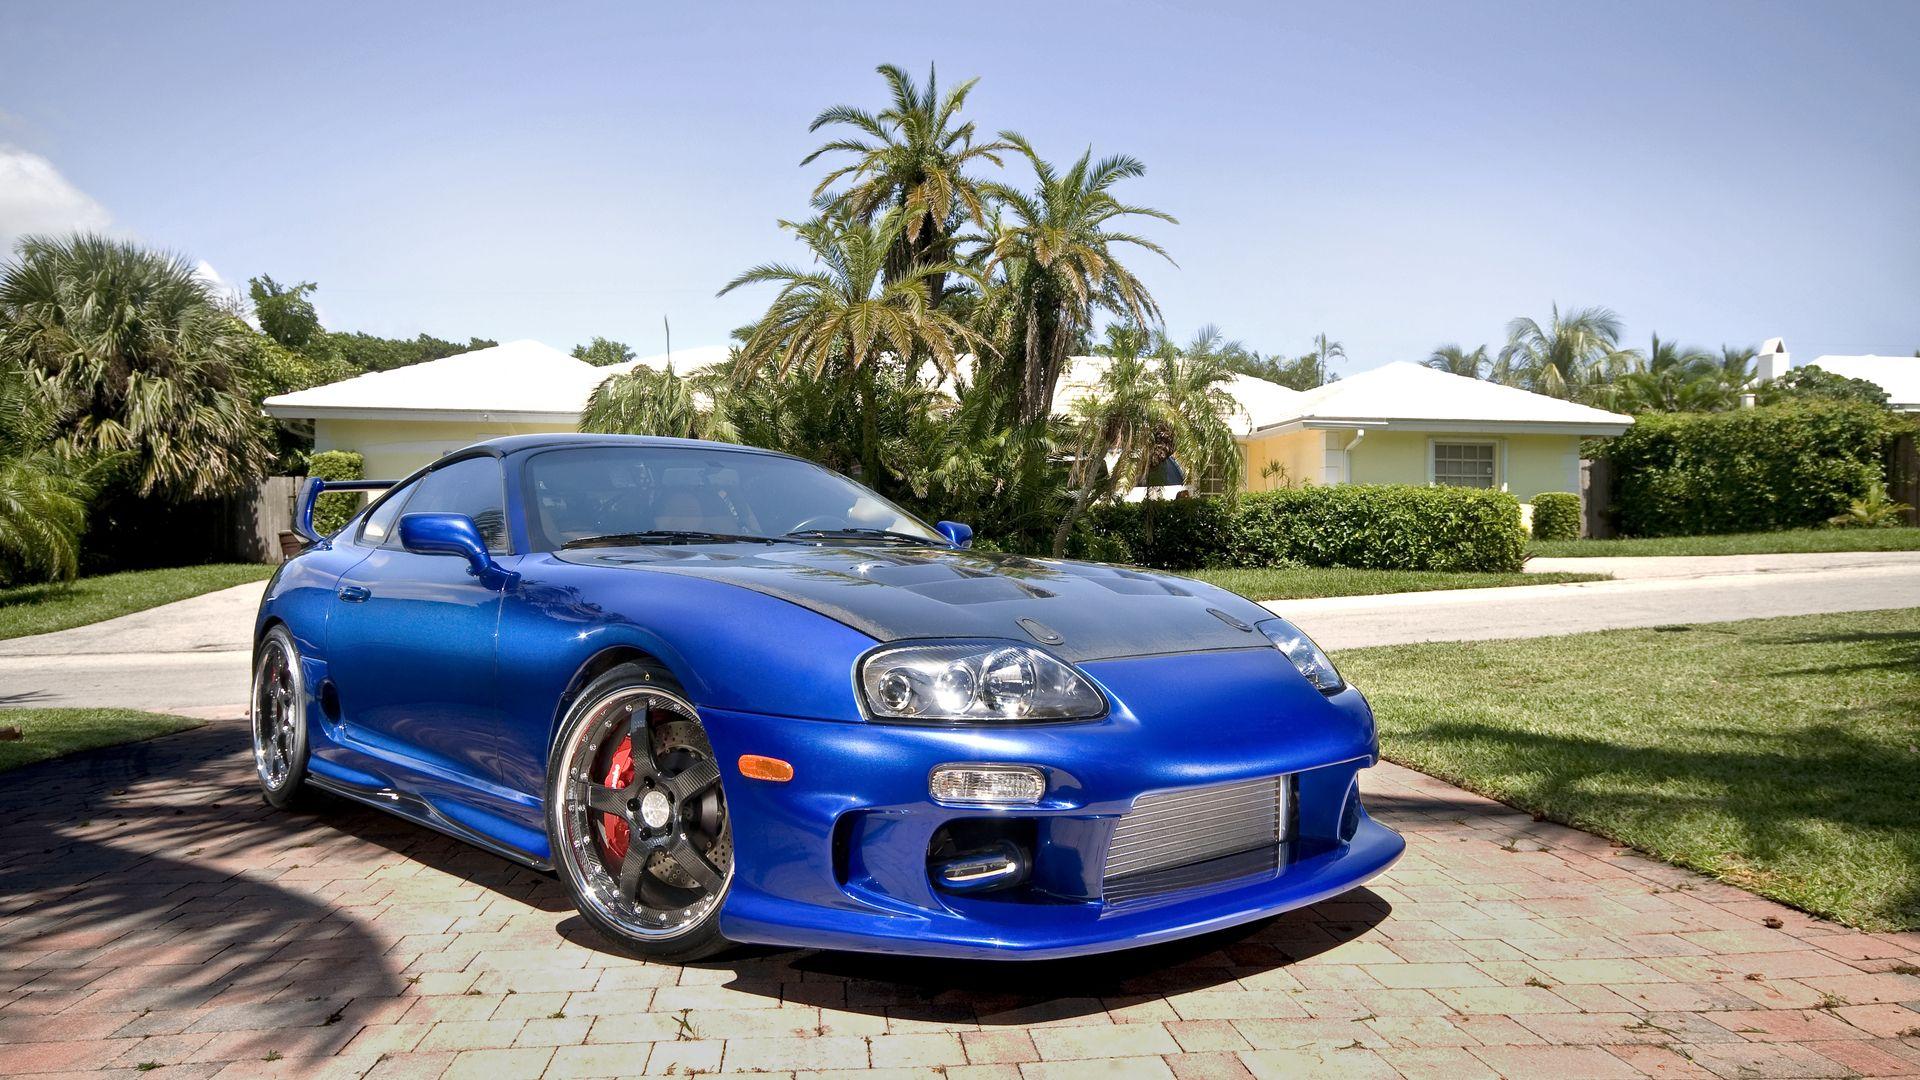 Bon 1996 #Toyota Supra Twin Turbo. Hot #Cars!